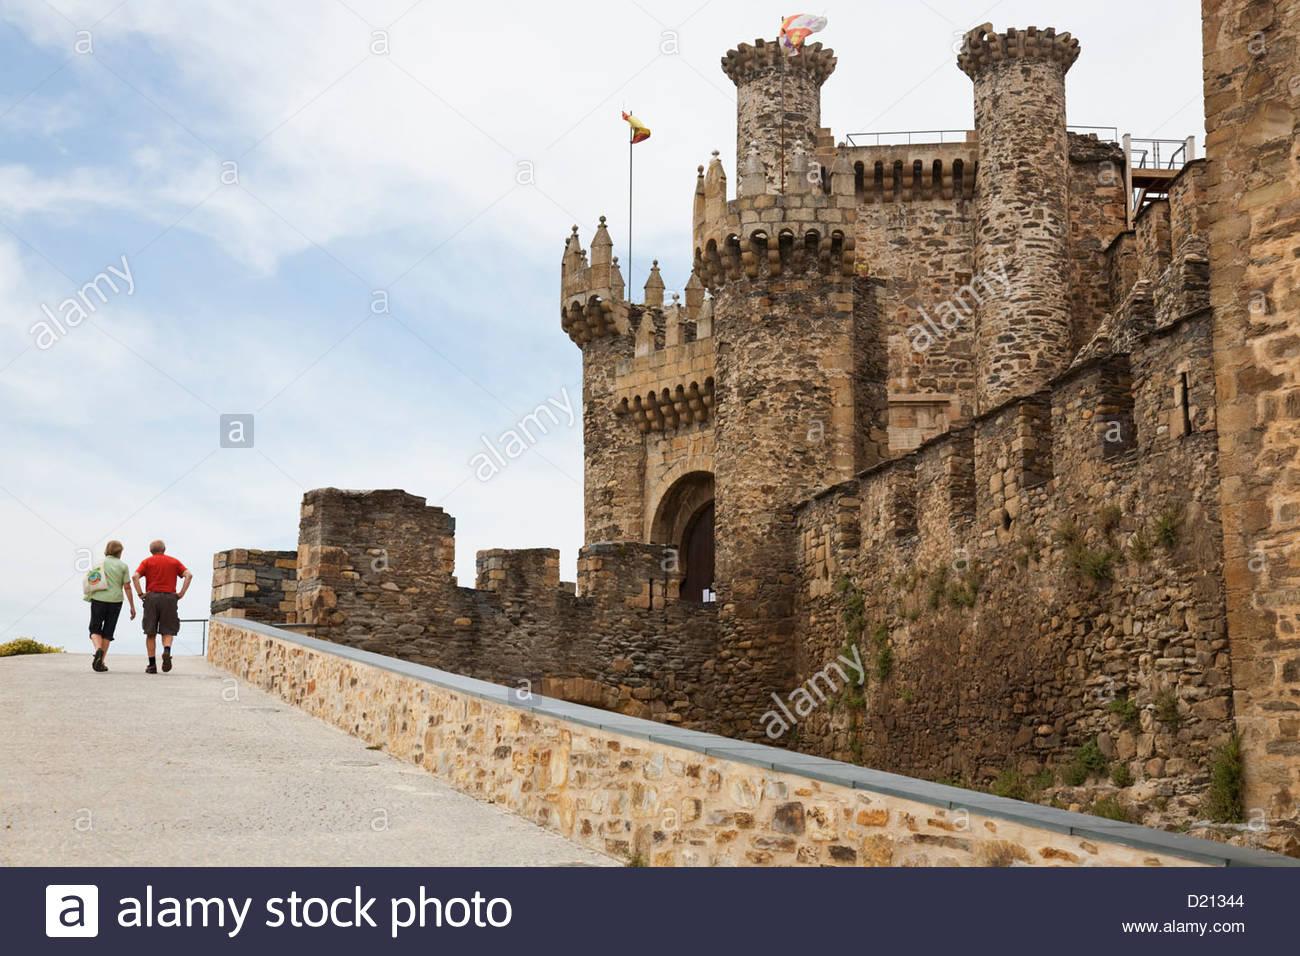 Templar castle in Ponferrada, Castile-Leon, Spain - Stock Image